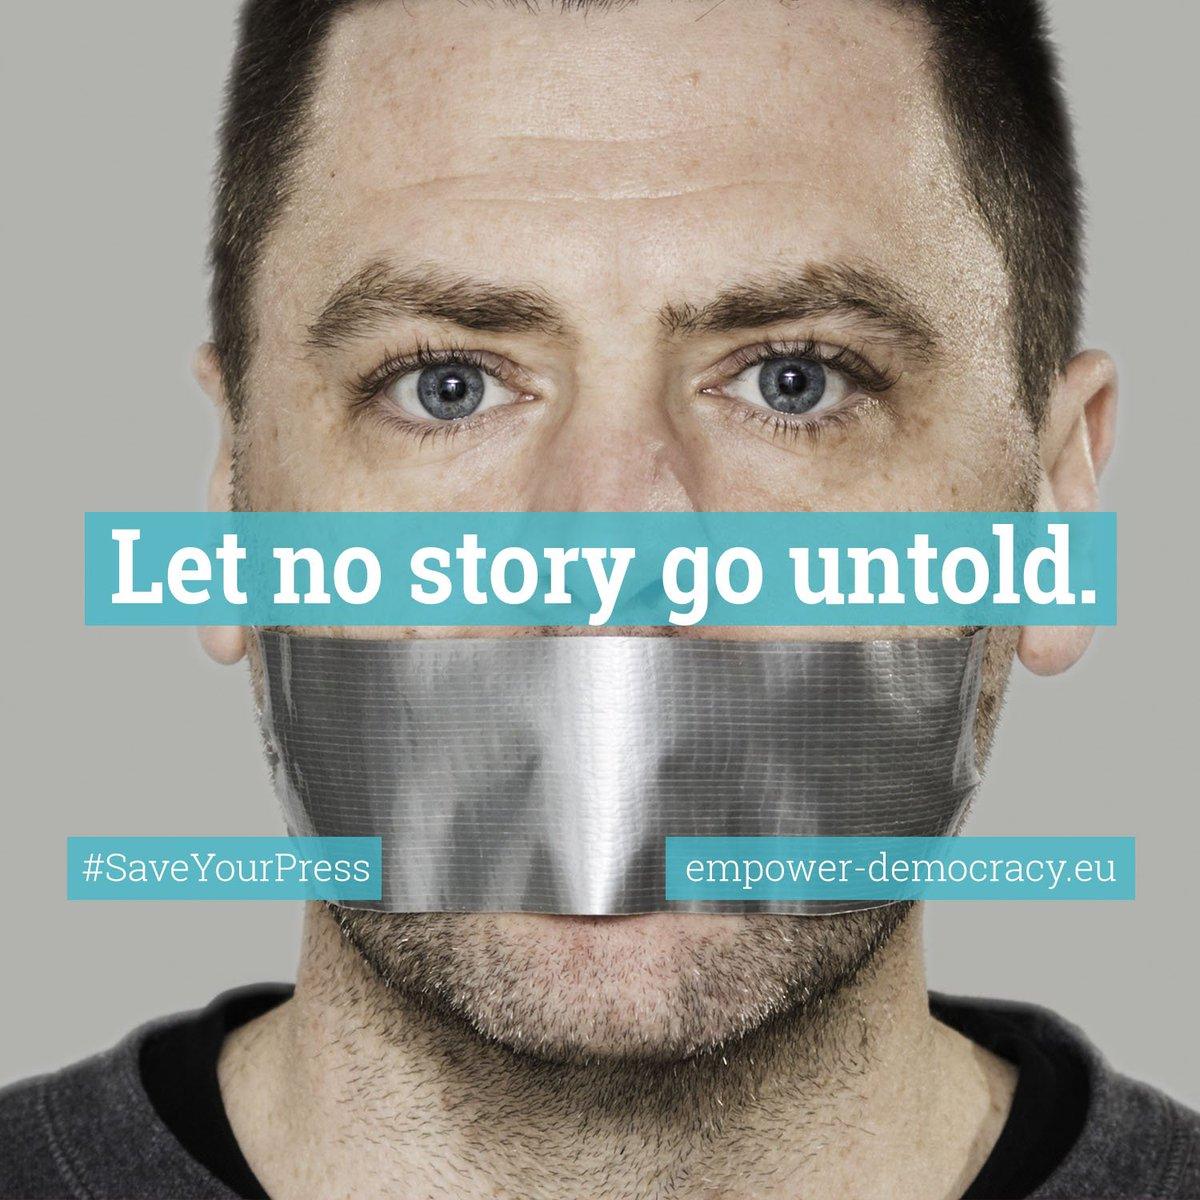 Less media means less variety of opinions #SaveYourPress #copyright  http://www. empower-democracy.eu  &nbsp;   @Aikakausmedia @SvTidskrifter<br>http://pic.twitter.com/7A45WICTu0